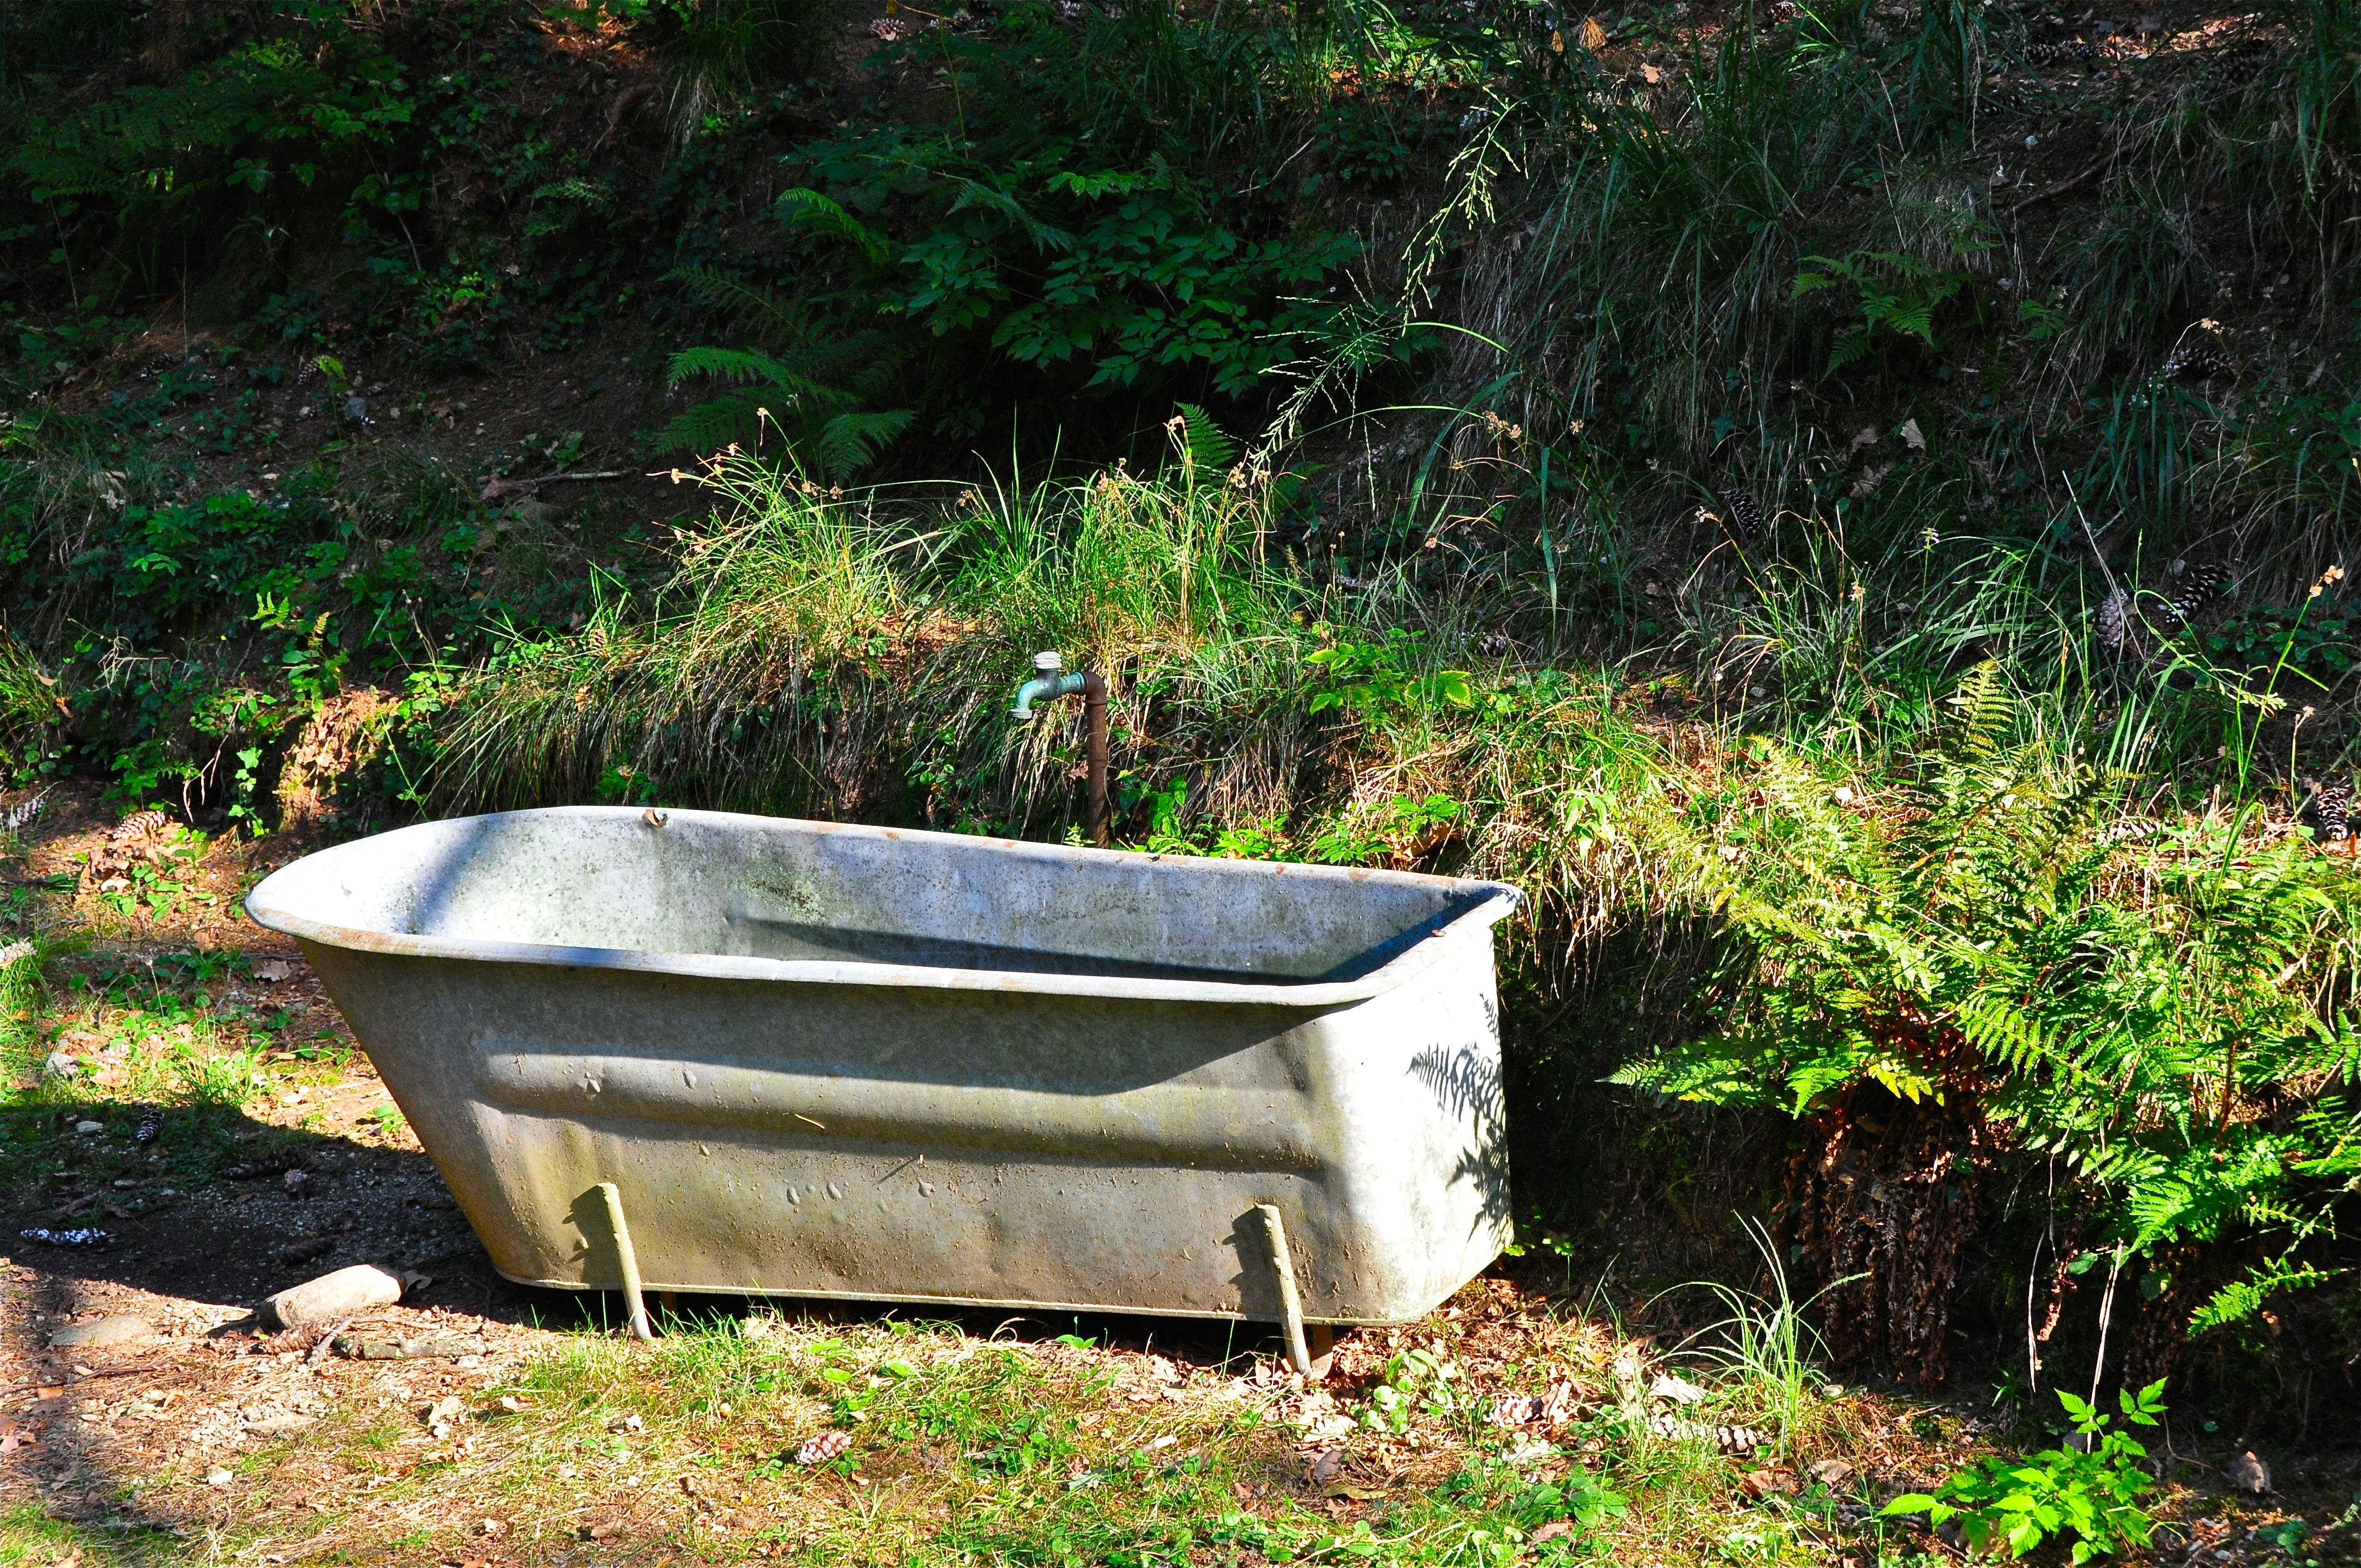 Vasca Da Bagno Wikipedia : File:monte verità vasca da bagno .jpg wikimedia commons